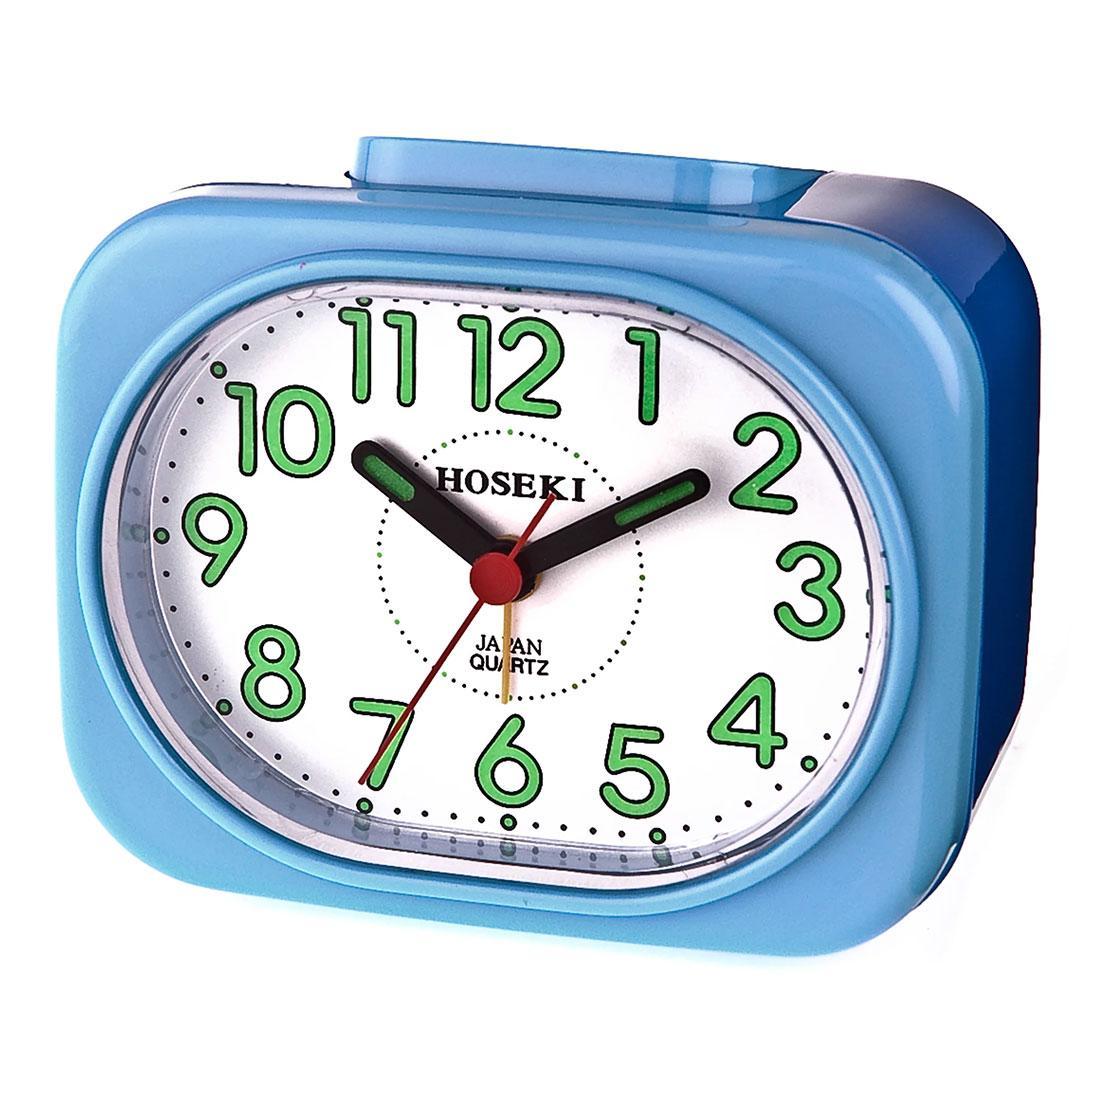 Hoseki H-9053 H-9053BL/W Blue Case White Dial Alarm Clock